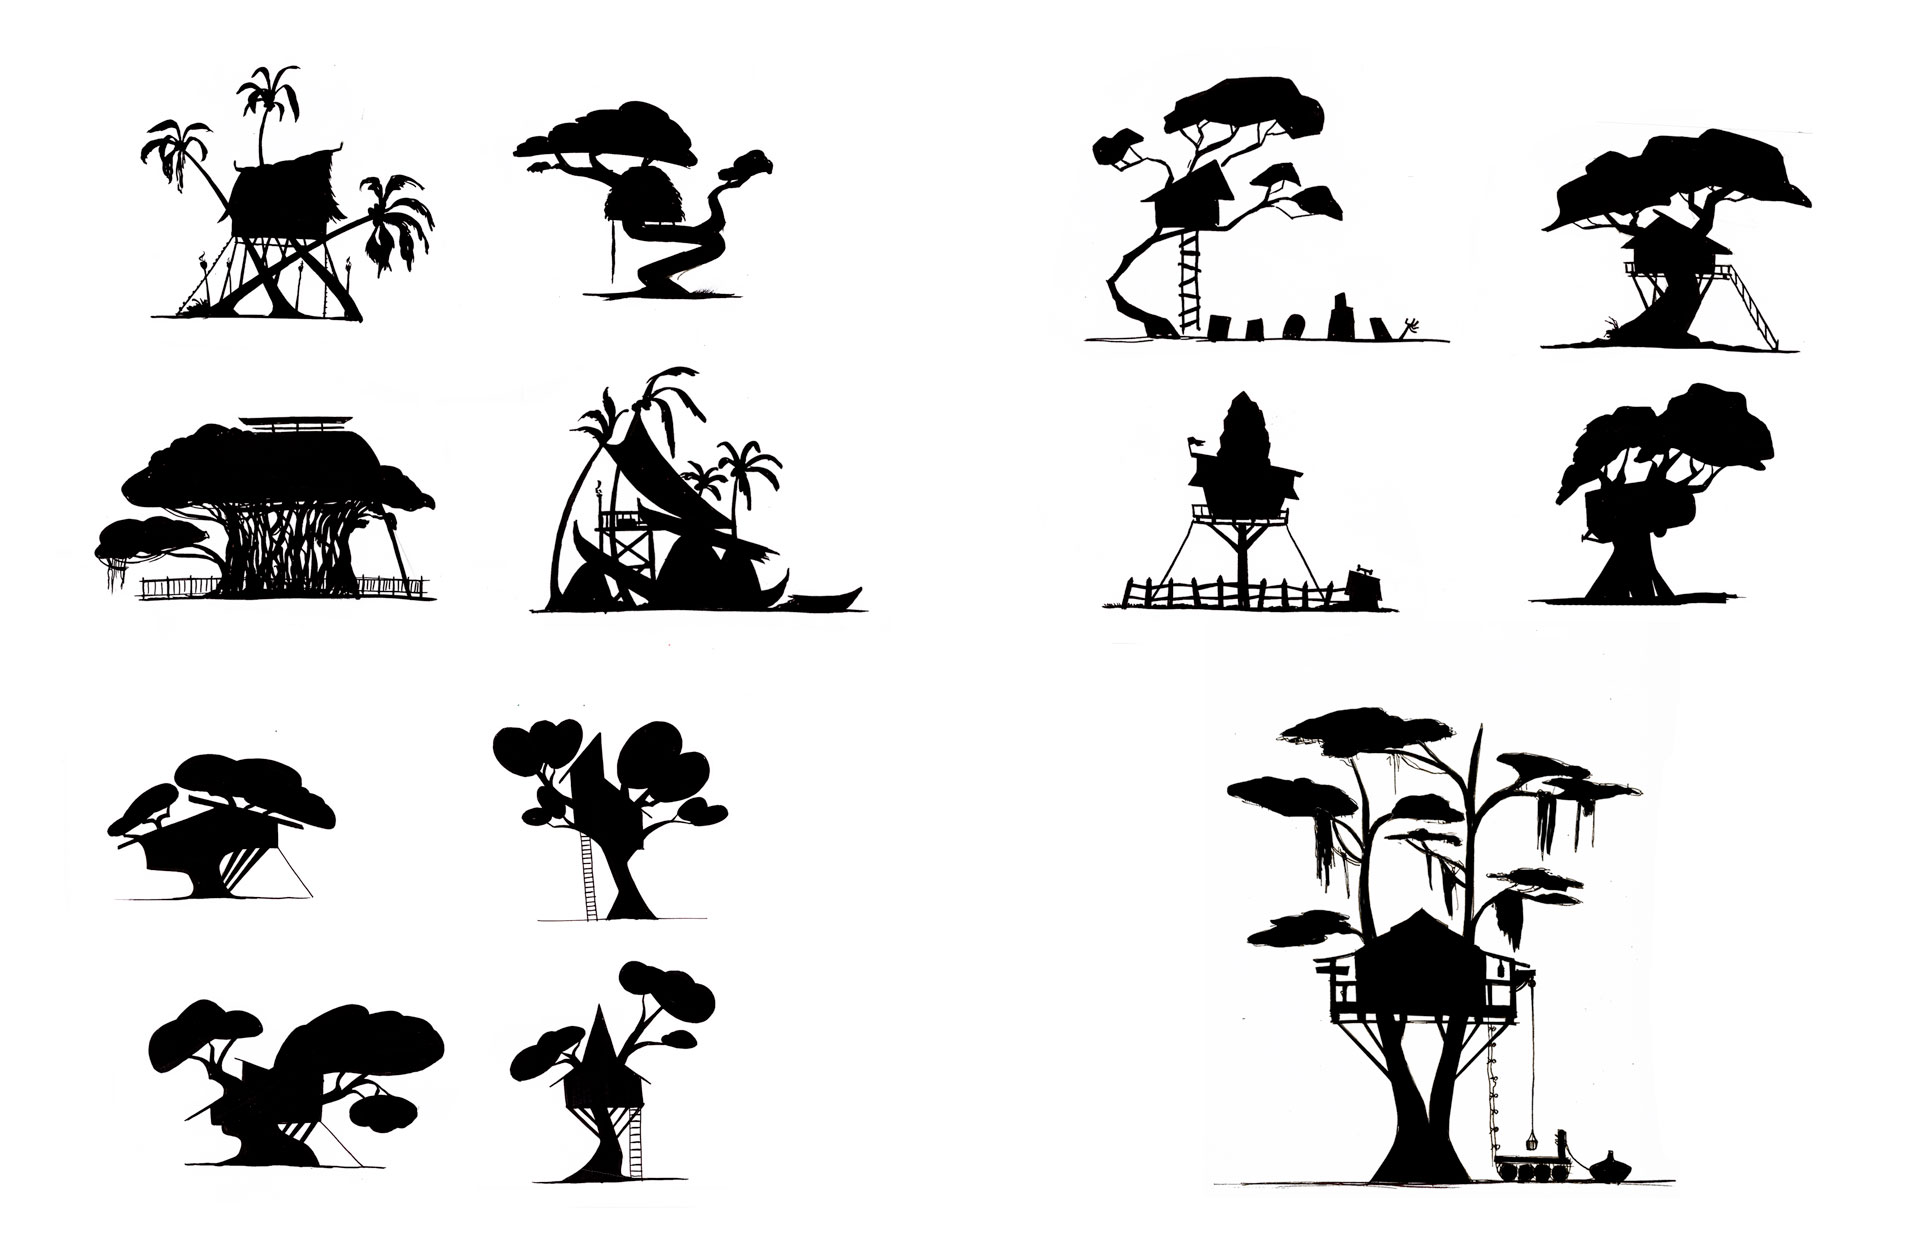 Tree House Silhouette Exploration